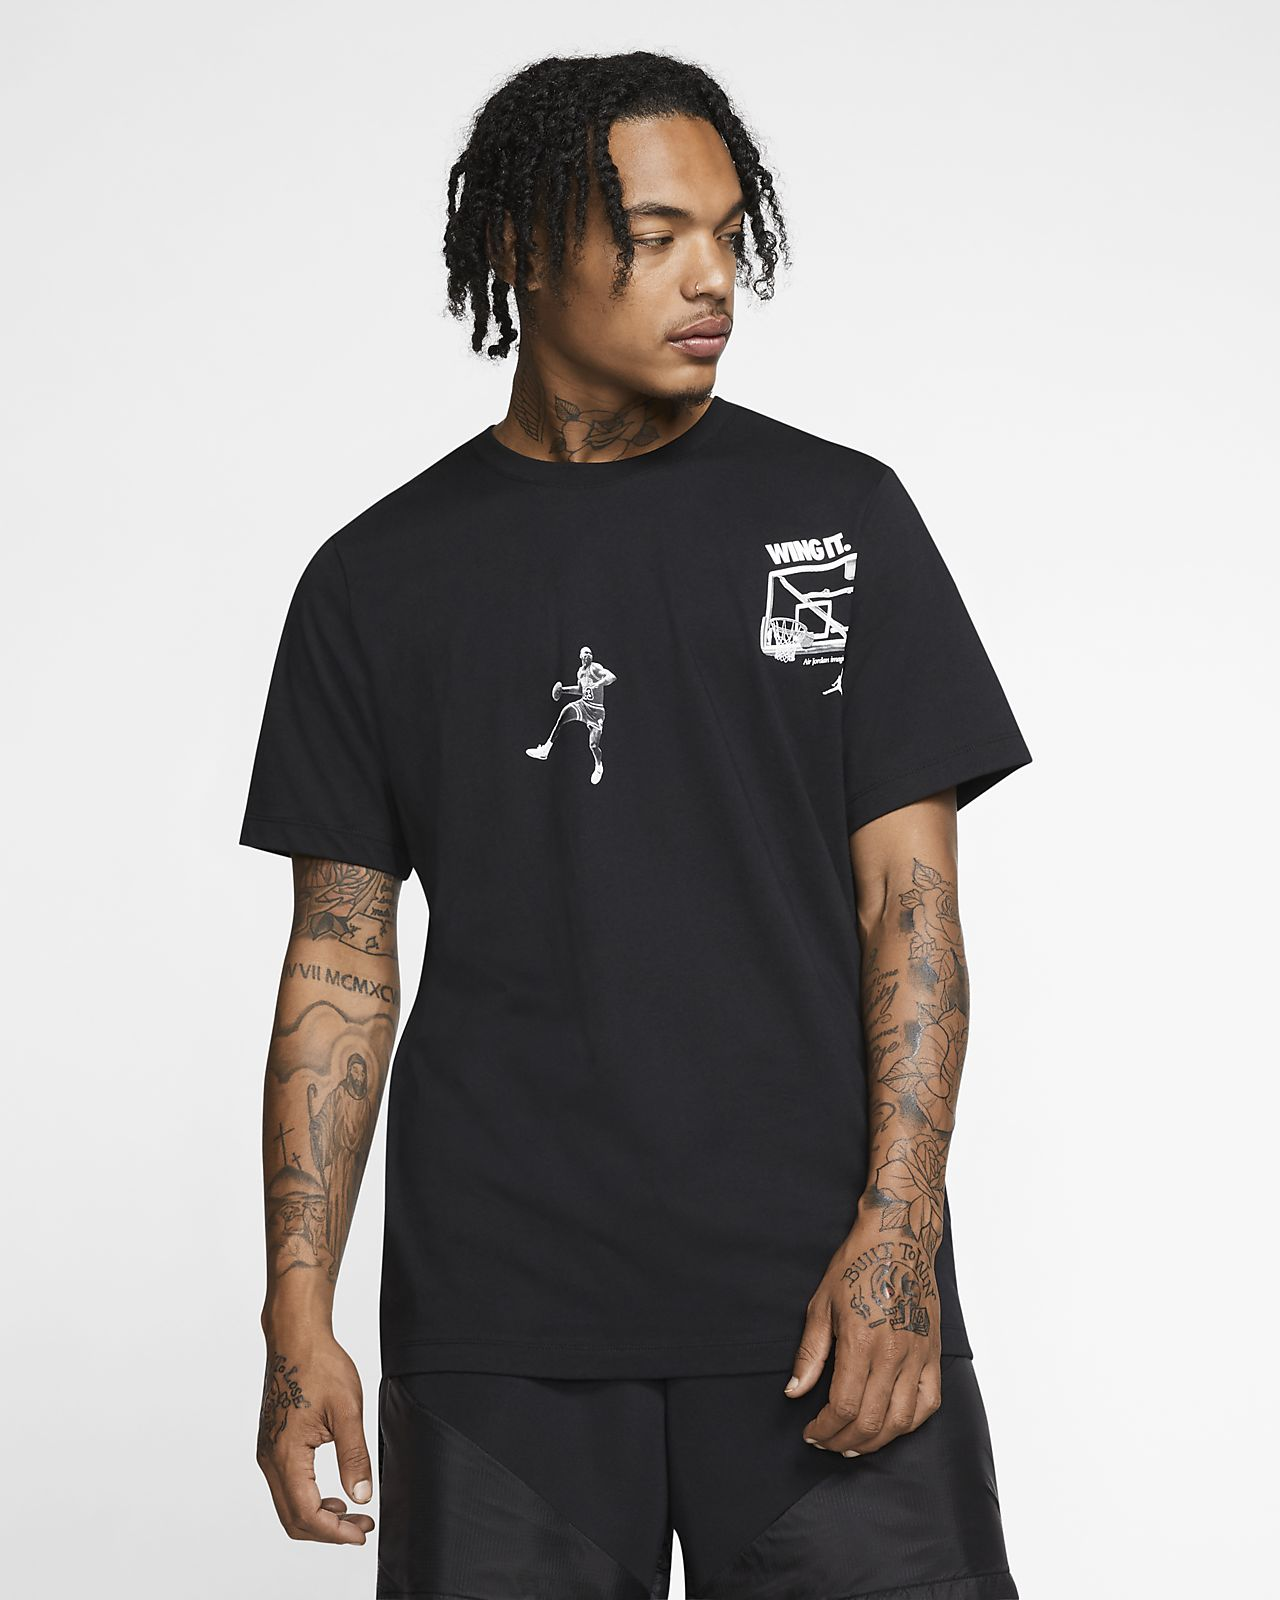 Jordan 'Wing It' Men's T-Shirt